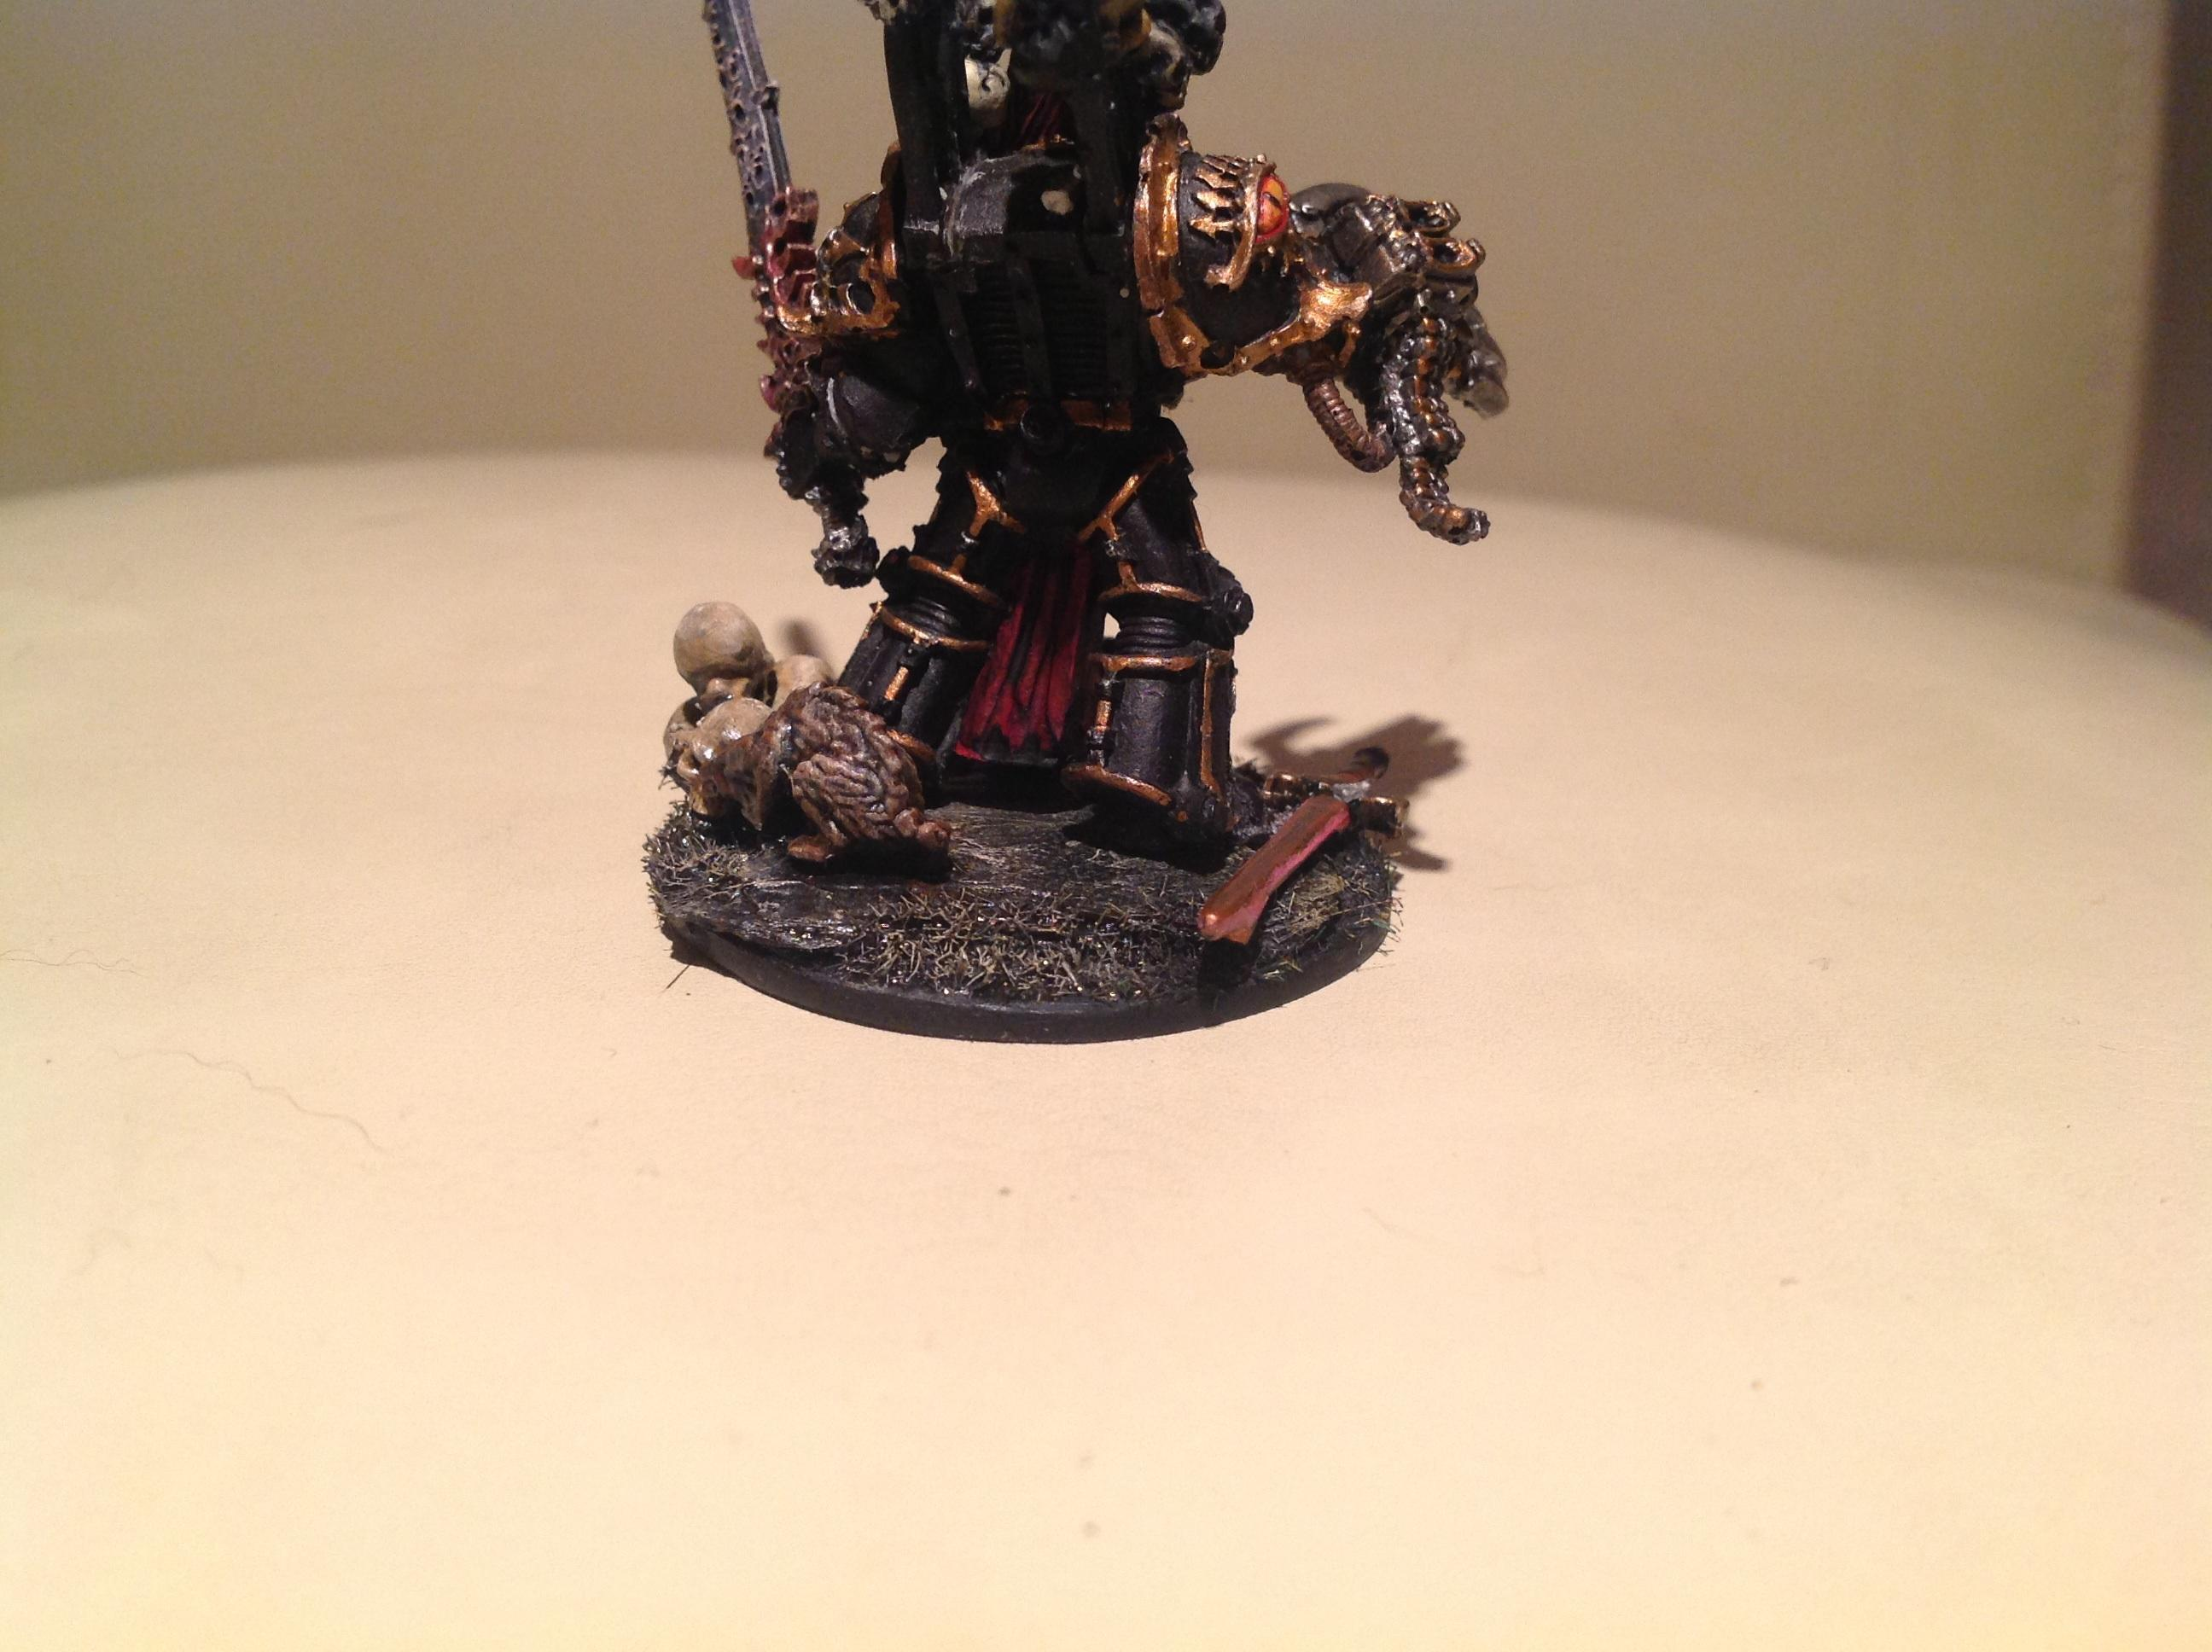 Abaddon, Abaddon The Despoiler, Black Legion, Chaos, Chaos Space Marines